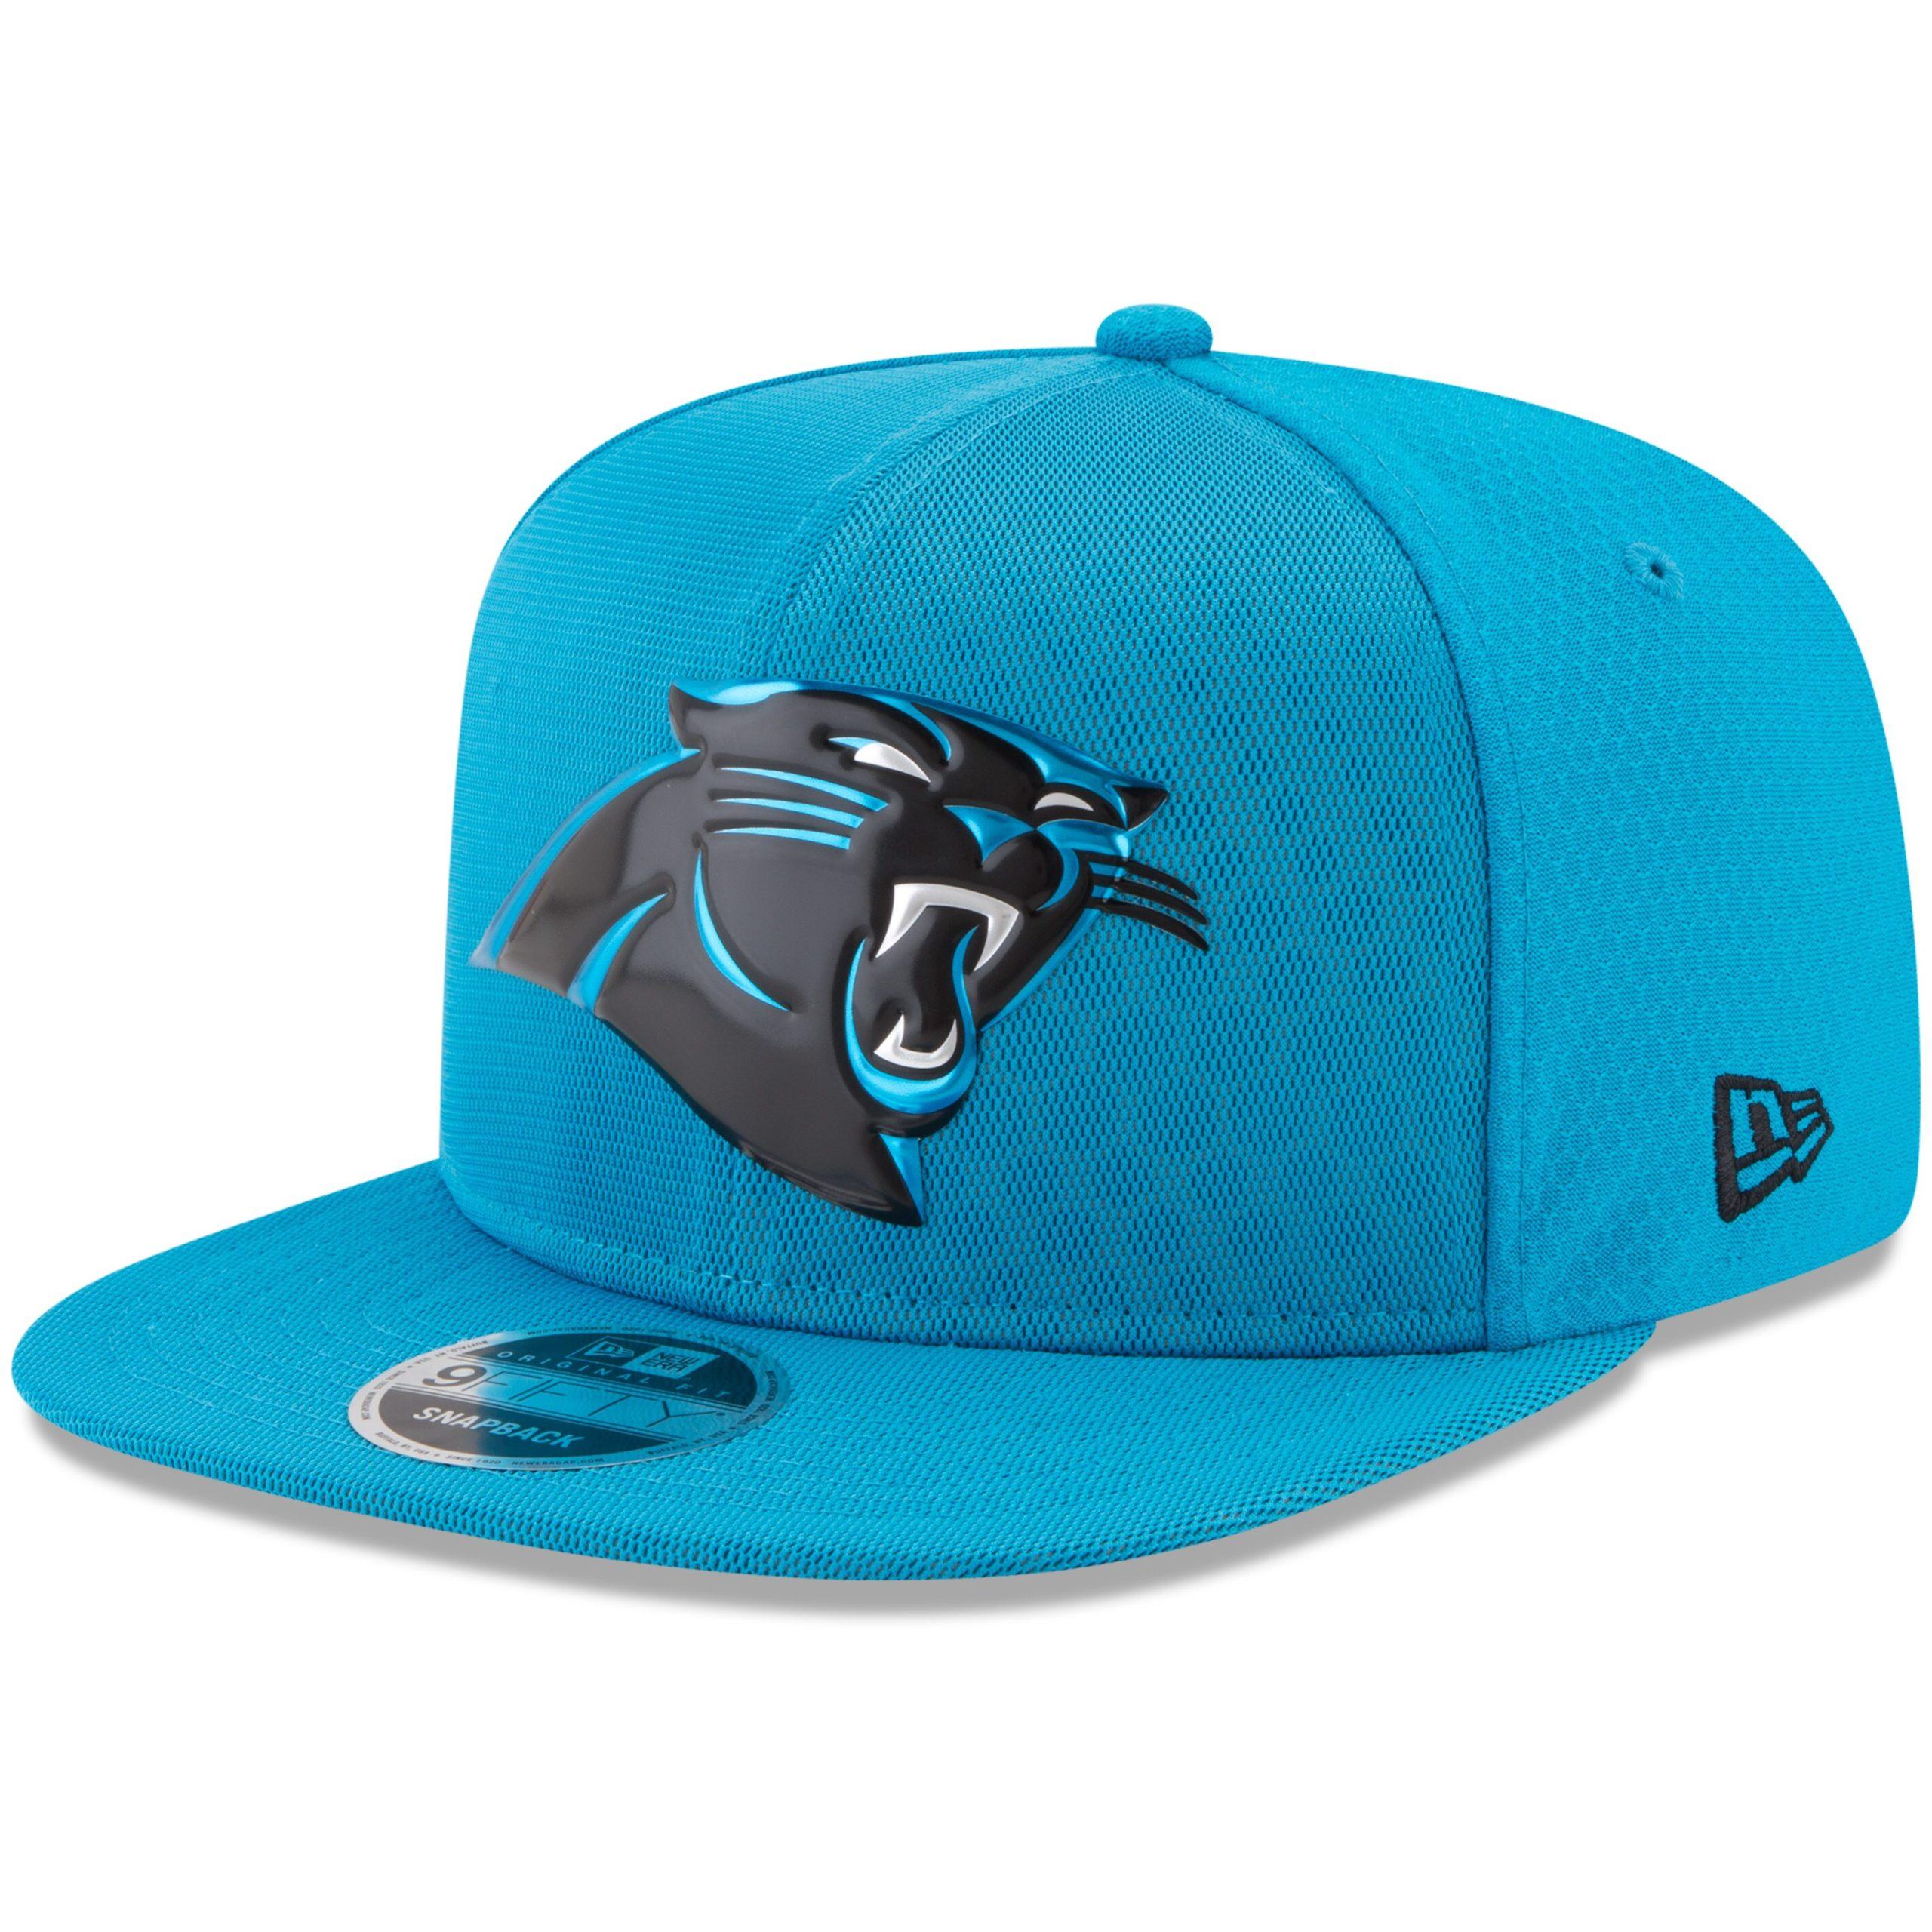 Carolina Panthers New Era Youth 2017 Color Rush 9FIFTY Snapback Adjustable Hat - Blue